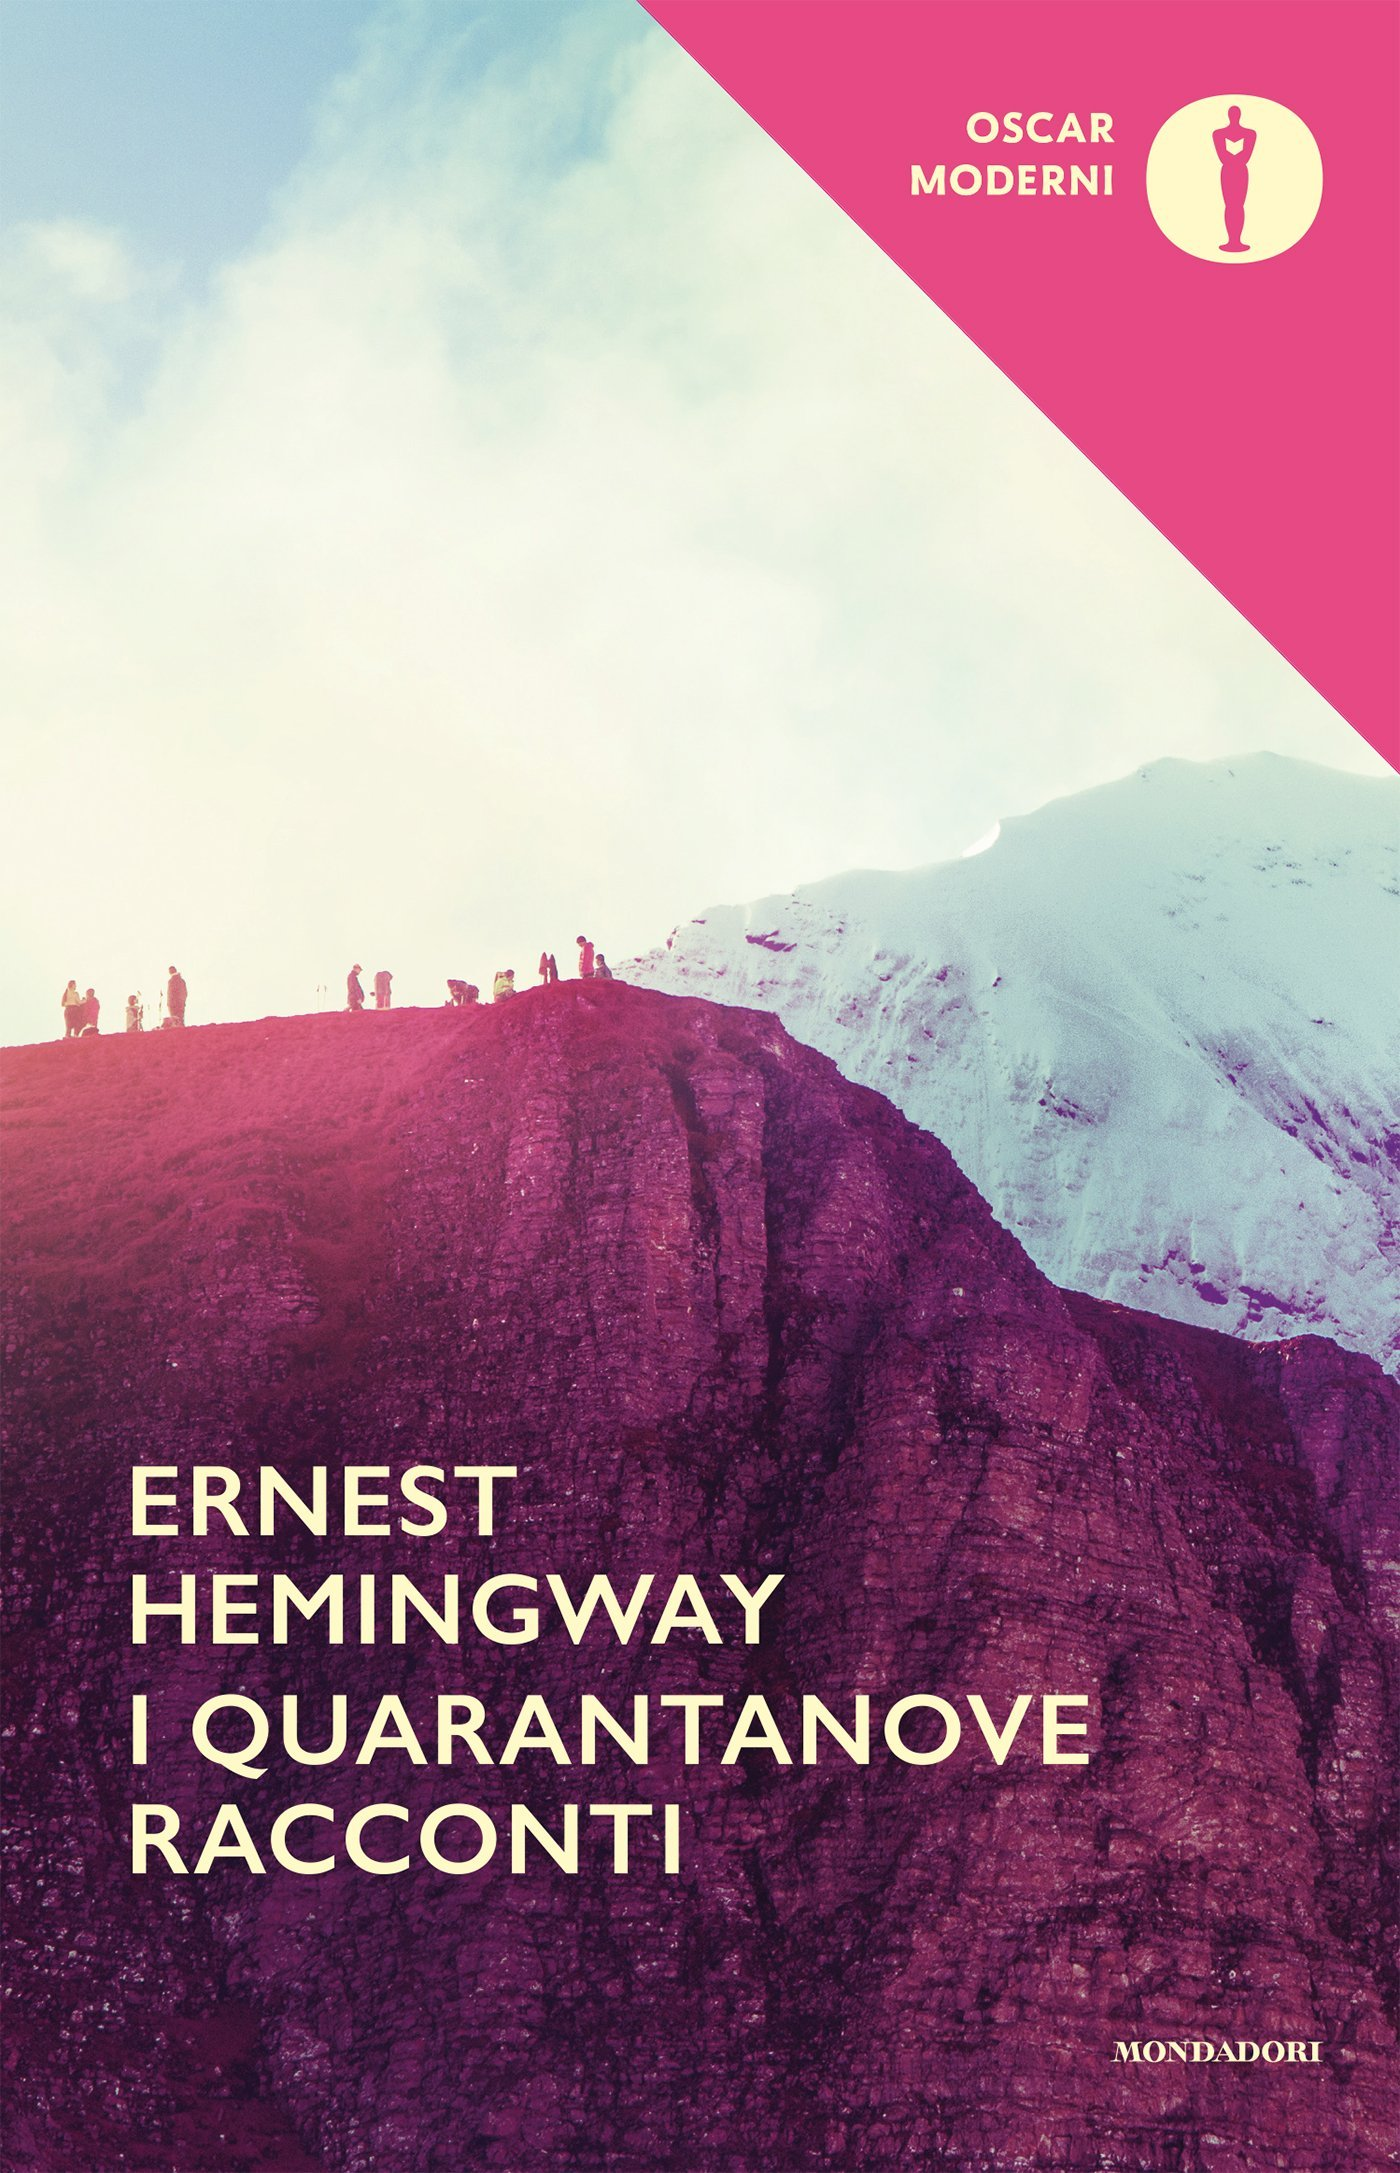 I quarantanove racconti Copertina flessibile – 24 mag 2016 Ernest Hemingway Mondadori 8804668334 Classics